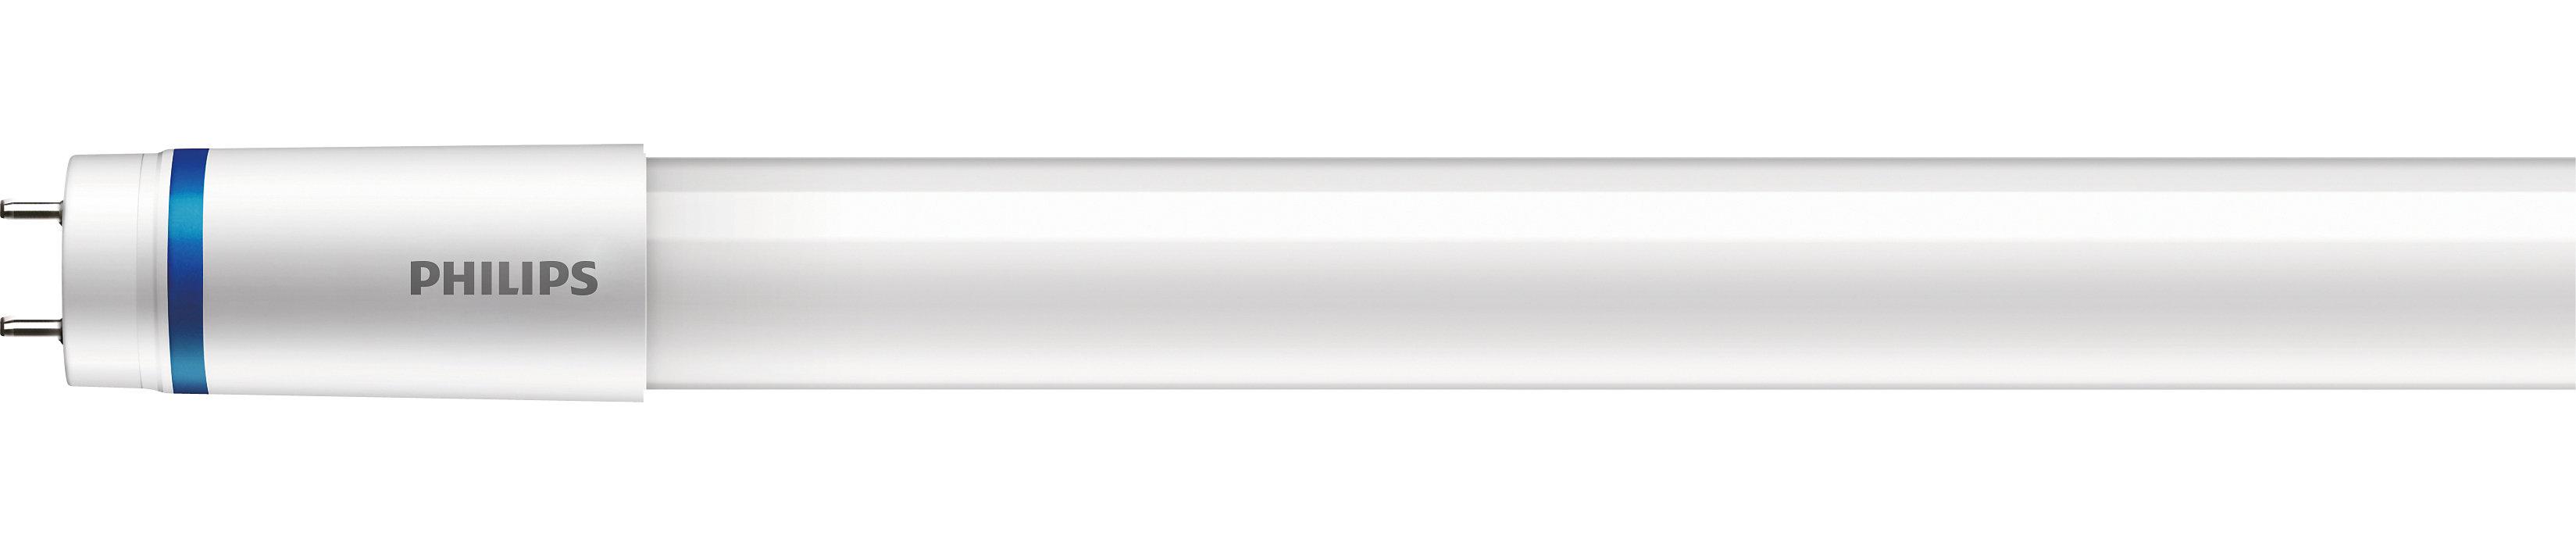 Noua generaţie de tuburi de iluminat cu consum redus de energie